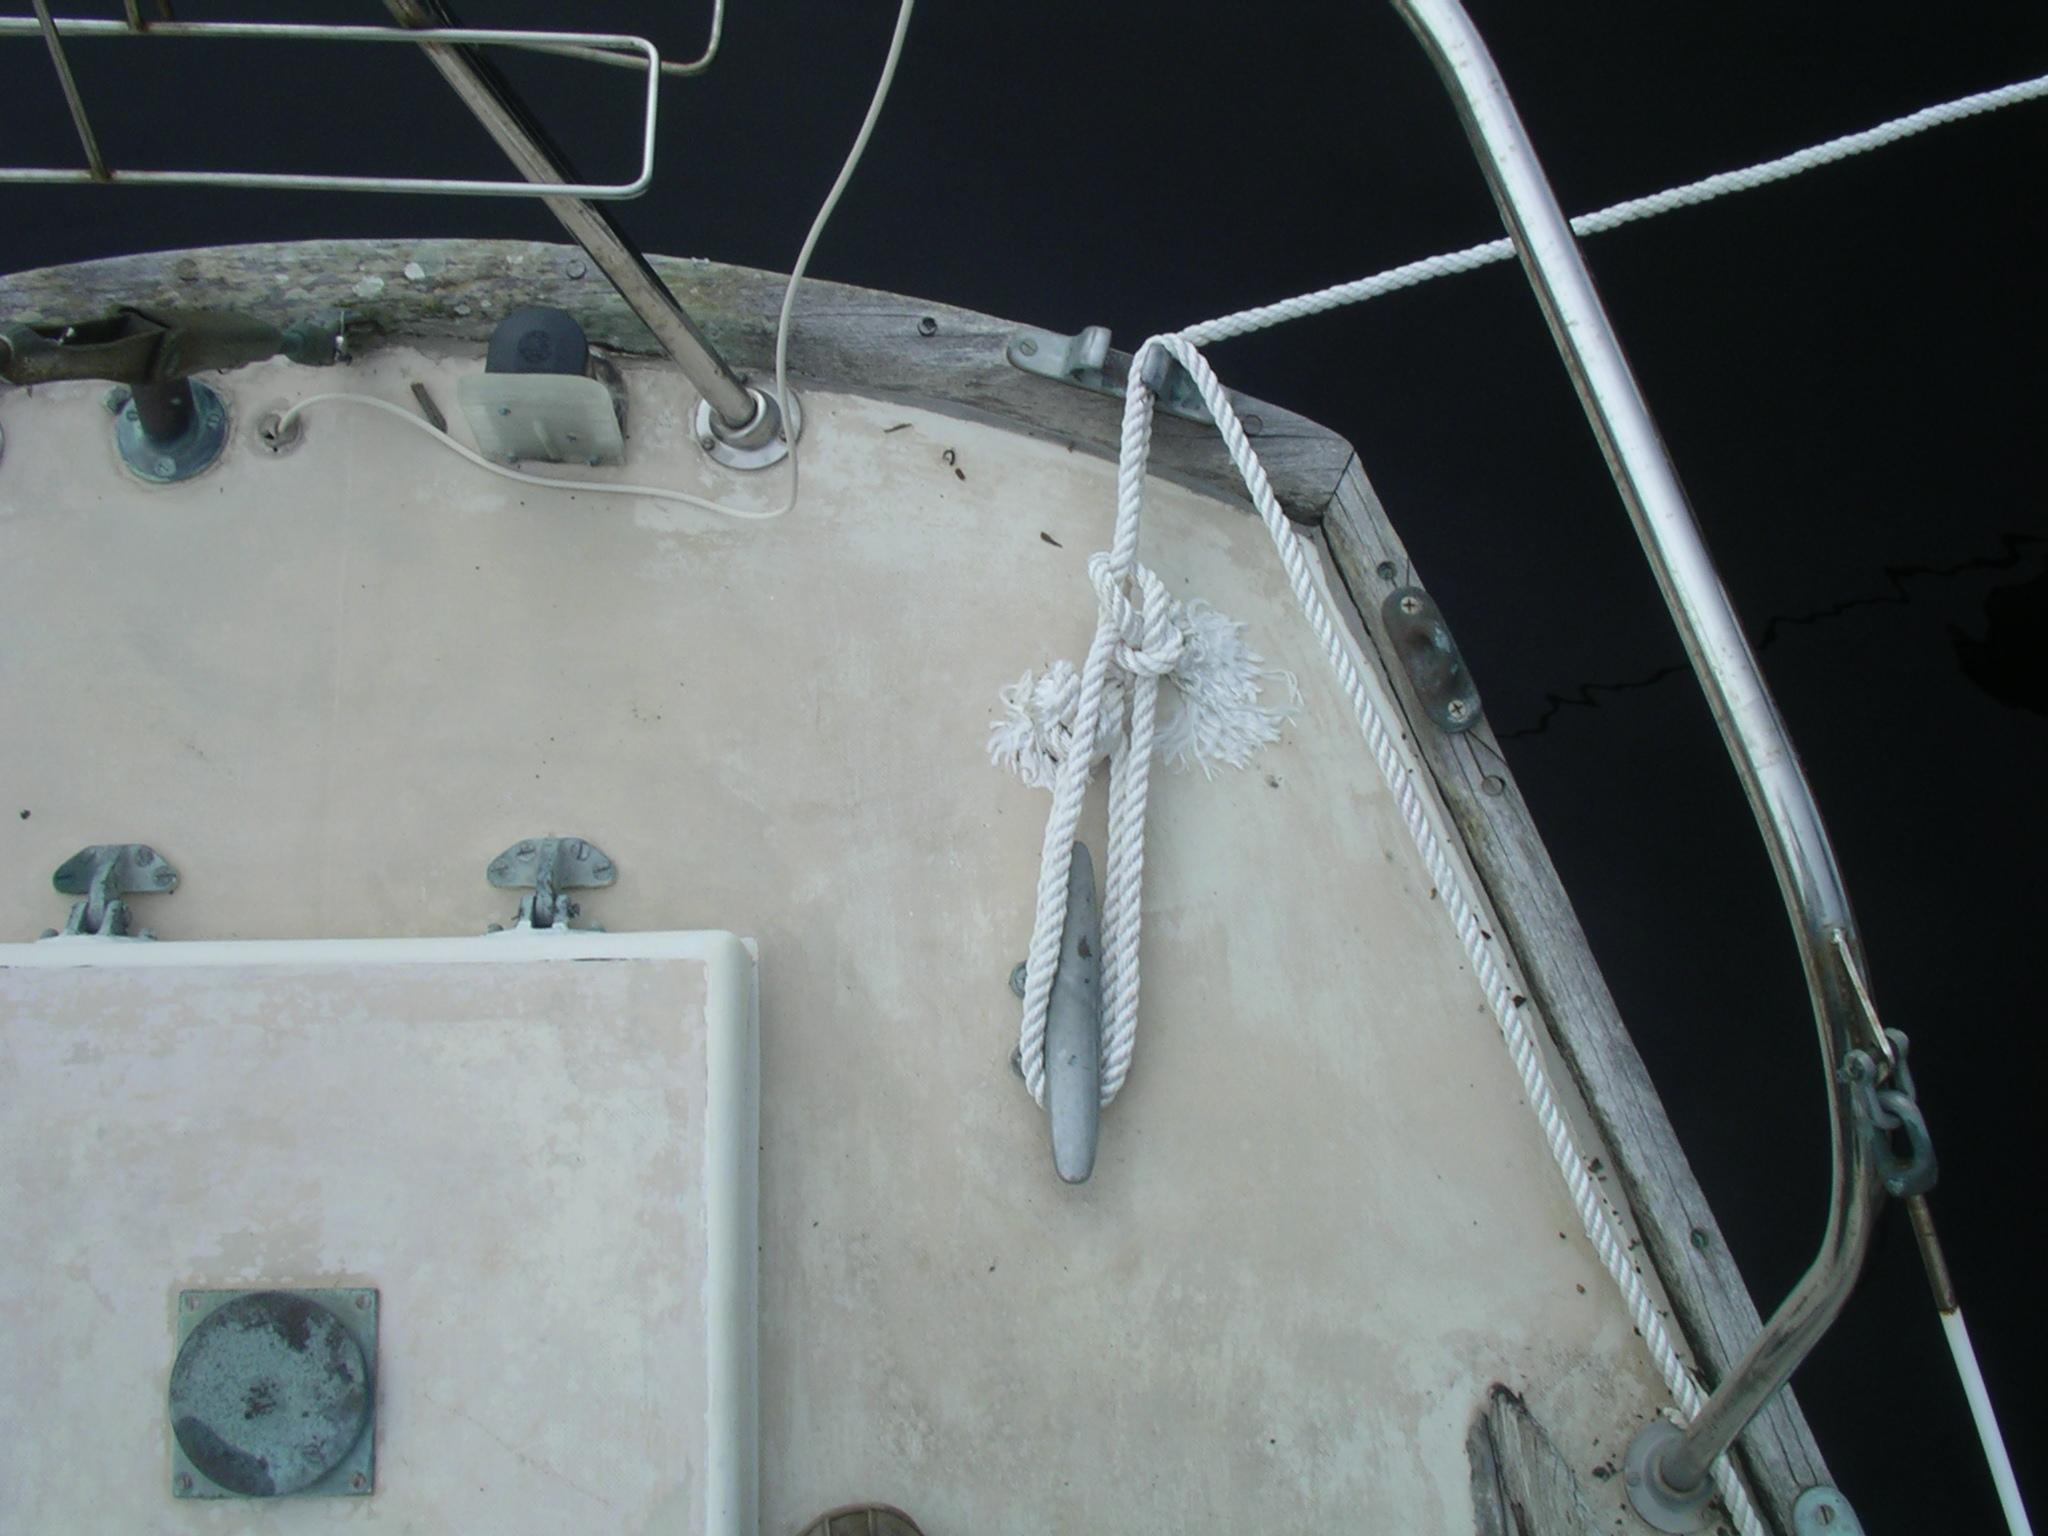 BoatDeck_July2010 (8).JPG